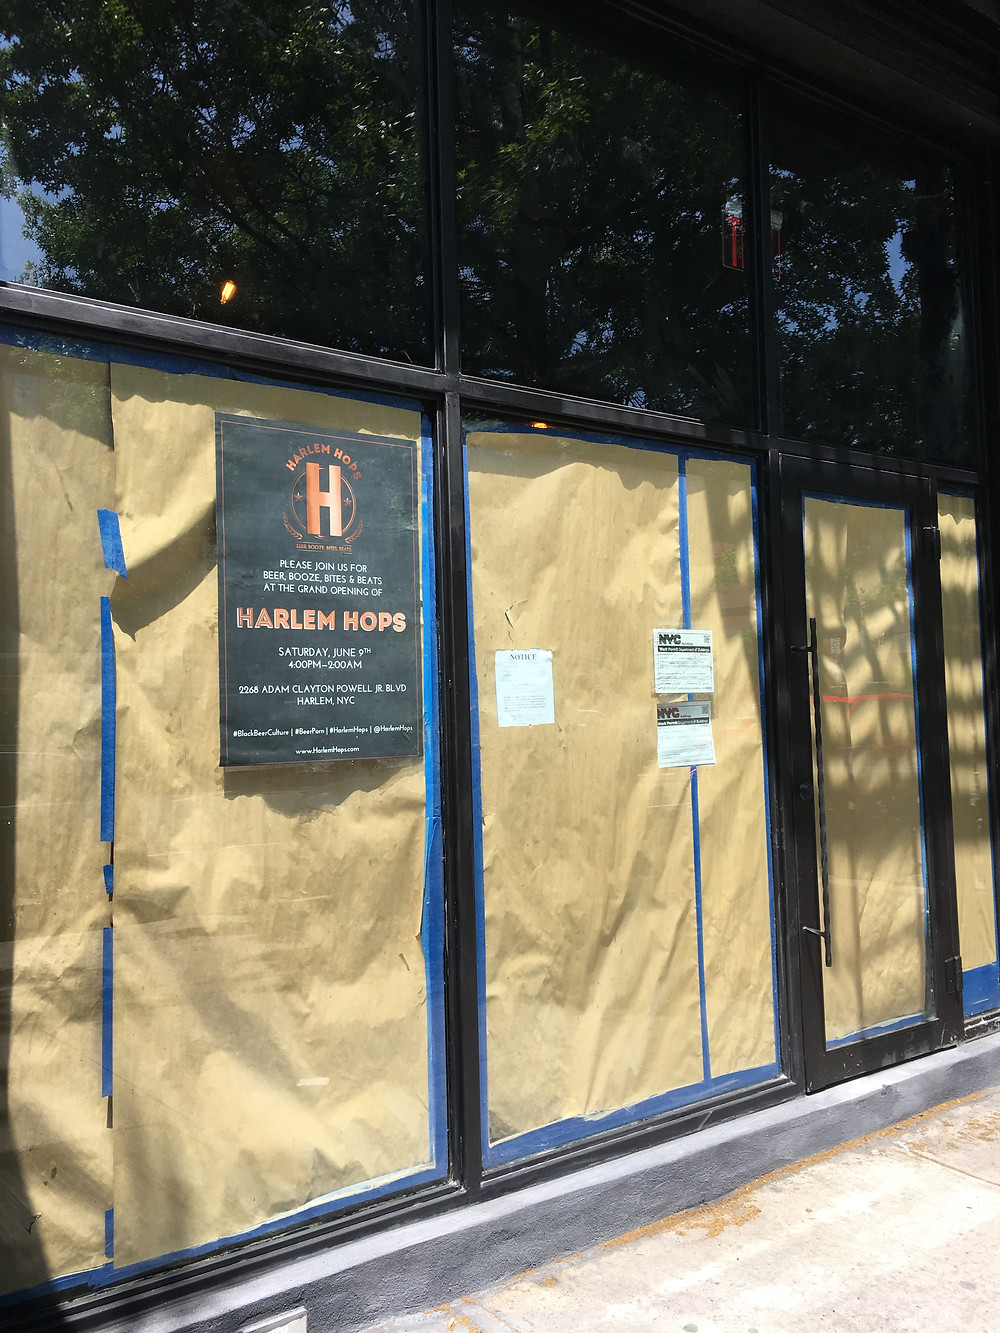 Harlem Hops on Adam Clayton Powell Jr Boulevard